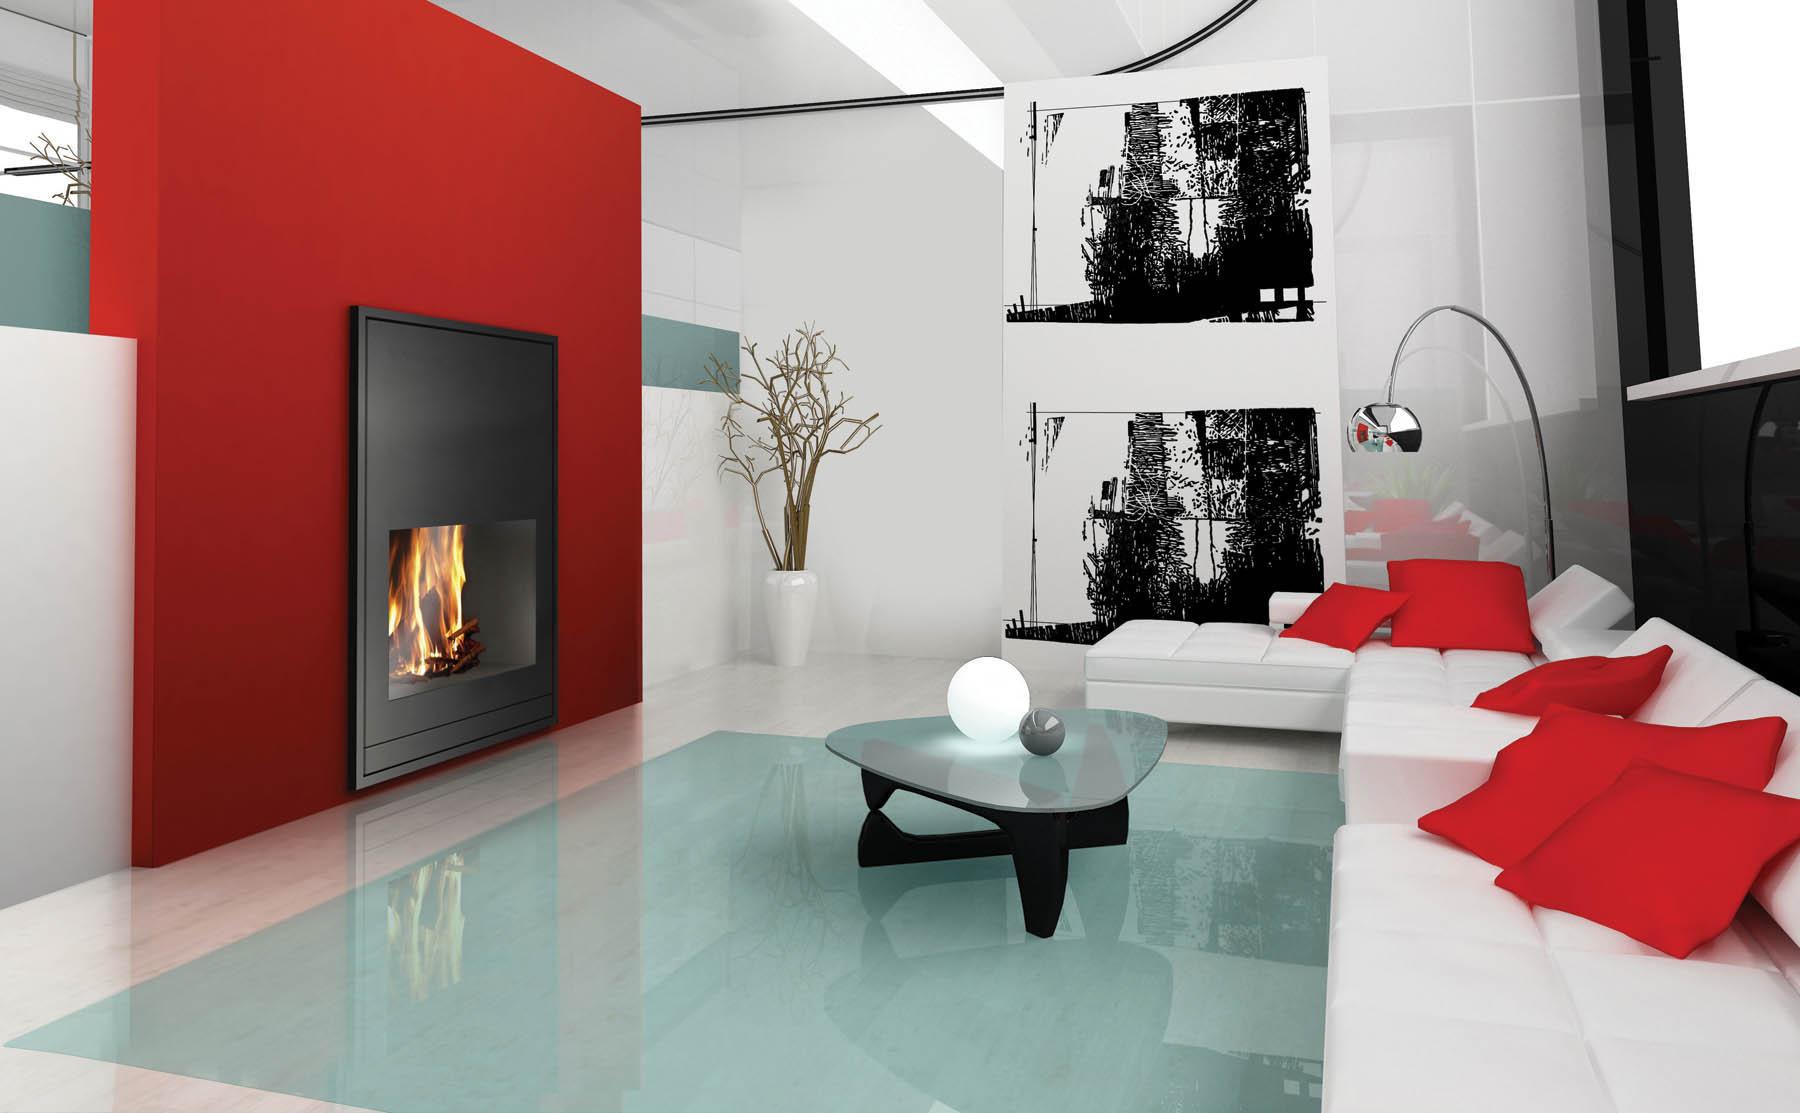 Calor de hogar con lo ltimo en dise o for Lo ultimo en diseno de interiores